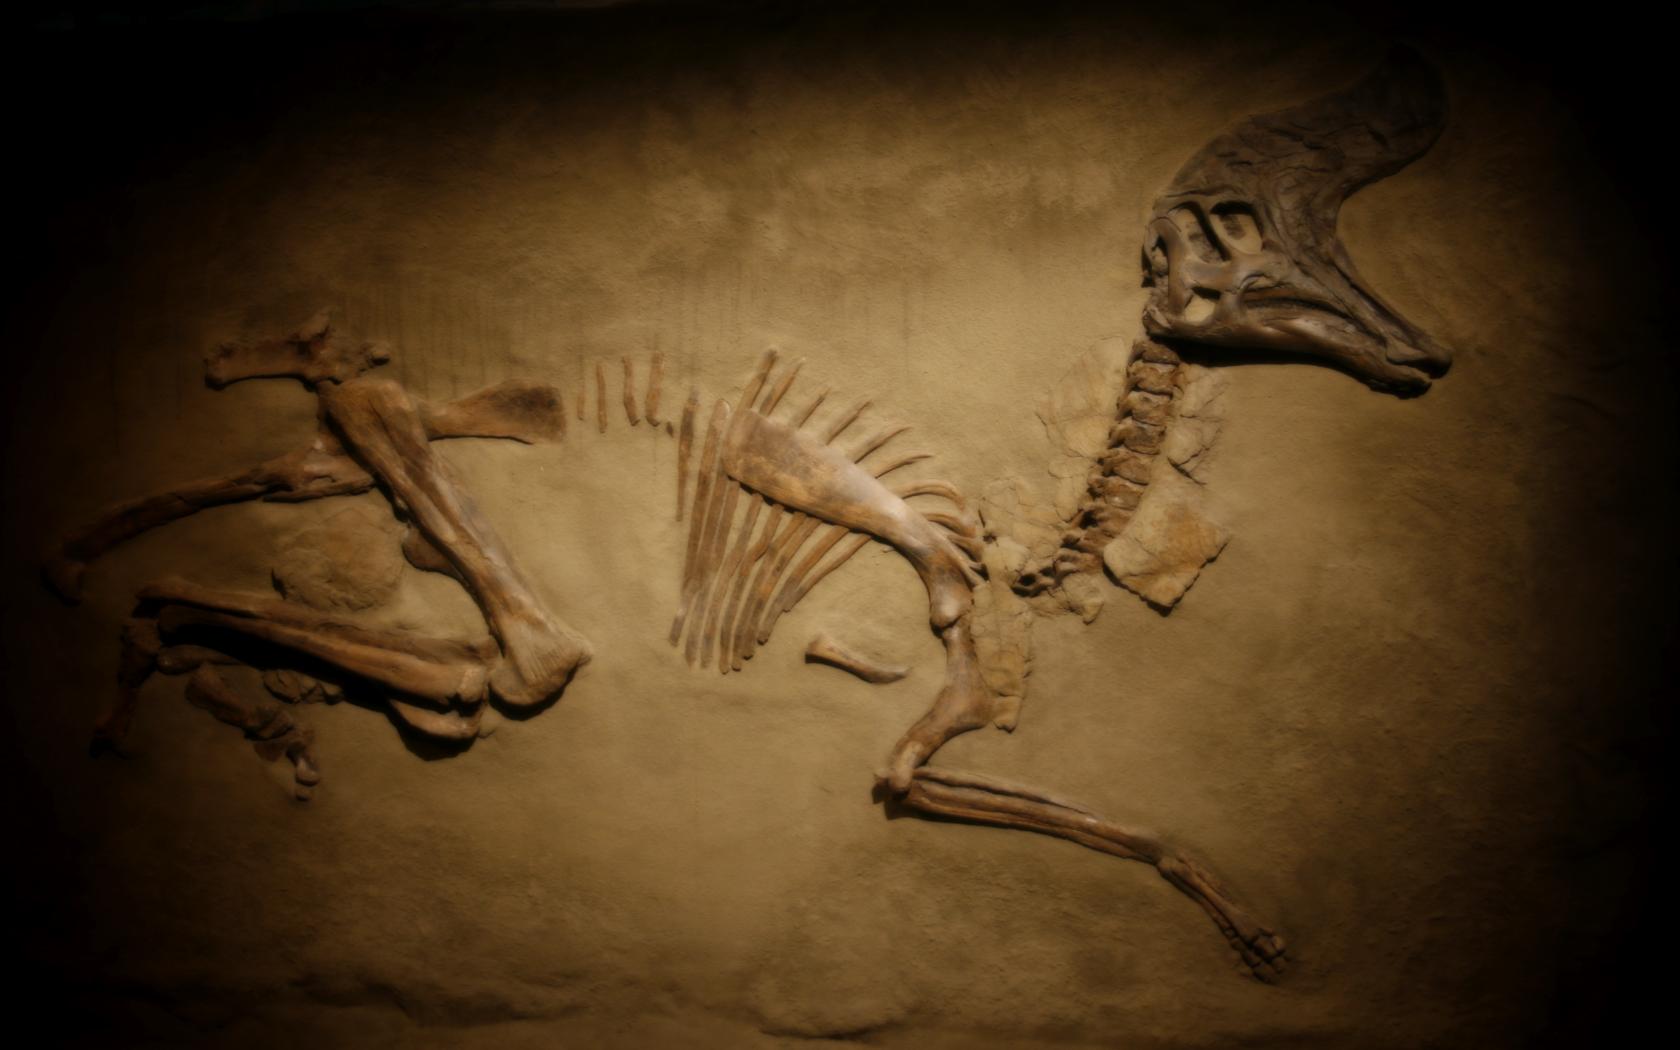 http://fc09.deviantart.net/fs32/f/2008/191/e/f/Dino_bones_wallpaper_by_devgear.jpg